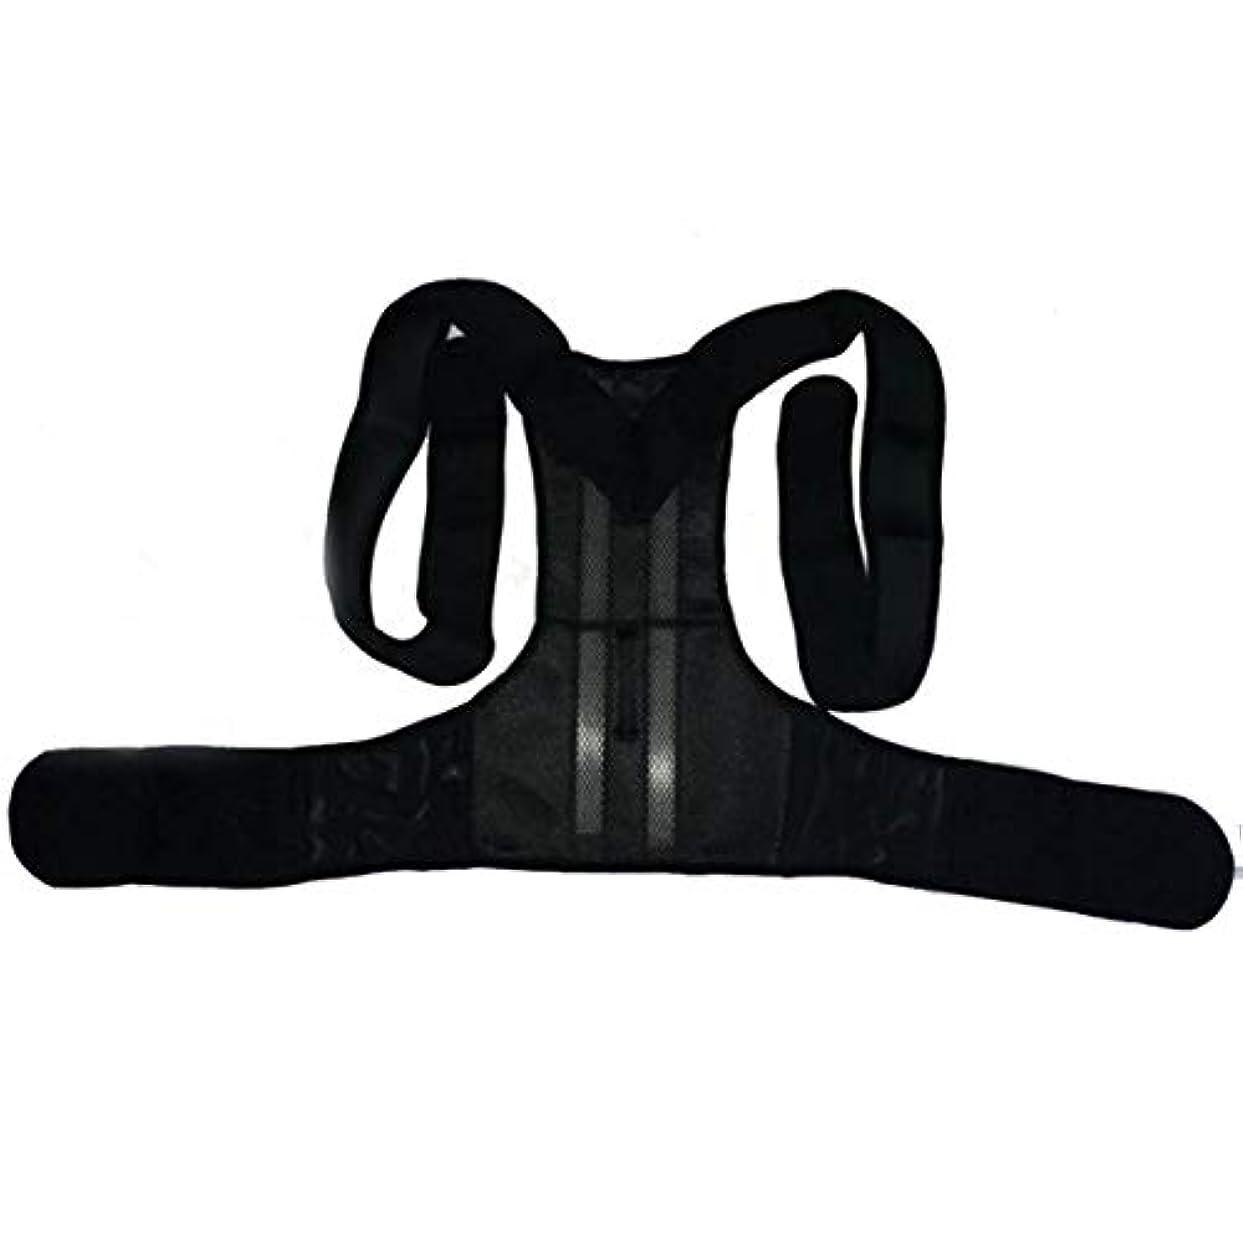 Intercorey含むサポートプレートhunchback訂正ベルト大人の背中固定ベルト用男性と女性姿勢矯正ベルト